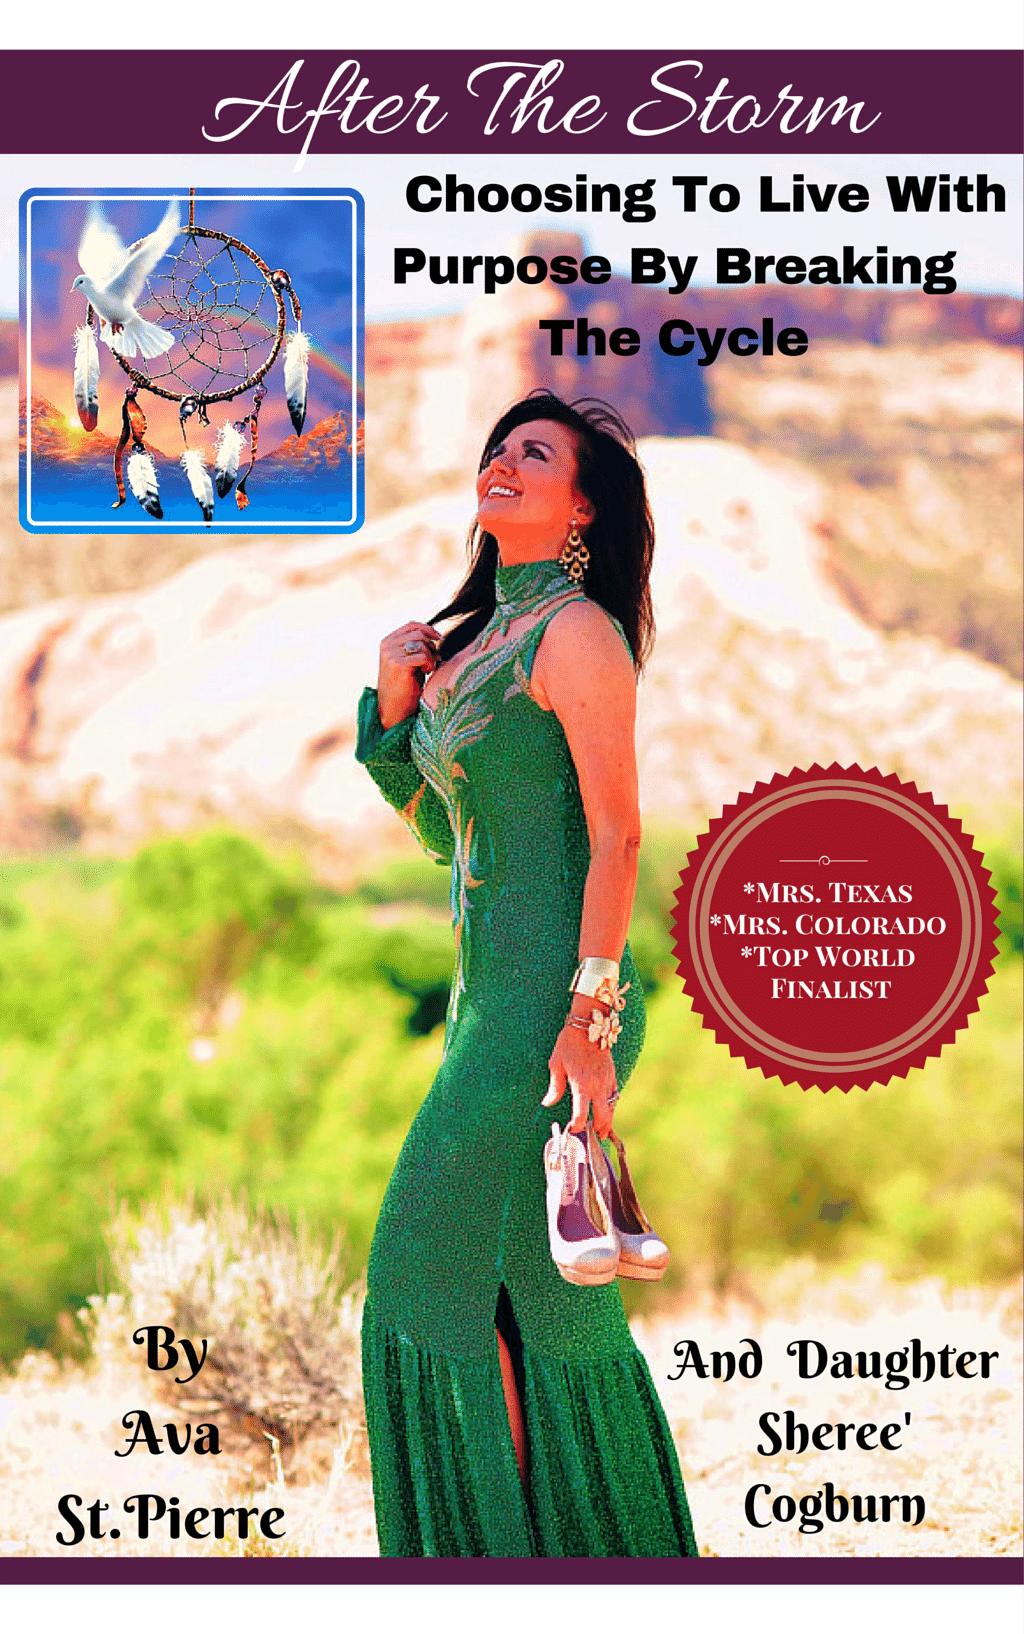 http://www.blogtalkradio.com/lifelessonsnetwork/2015/04/17/ava-pierre-cogburn-shares-her-life-lessons